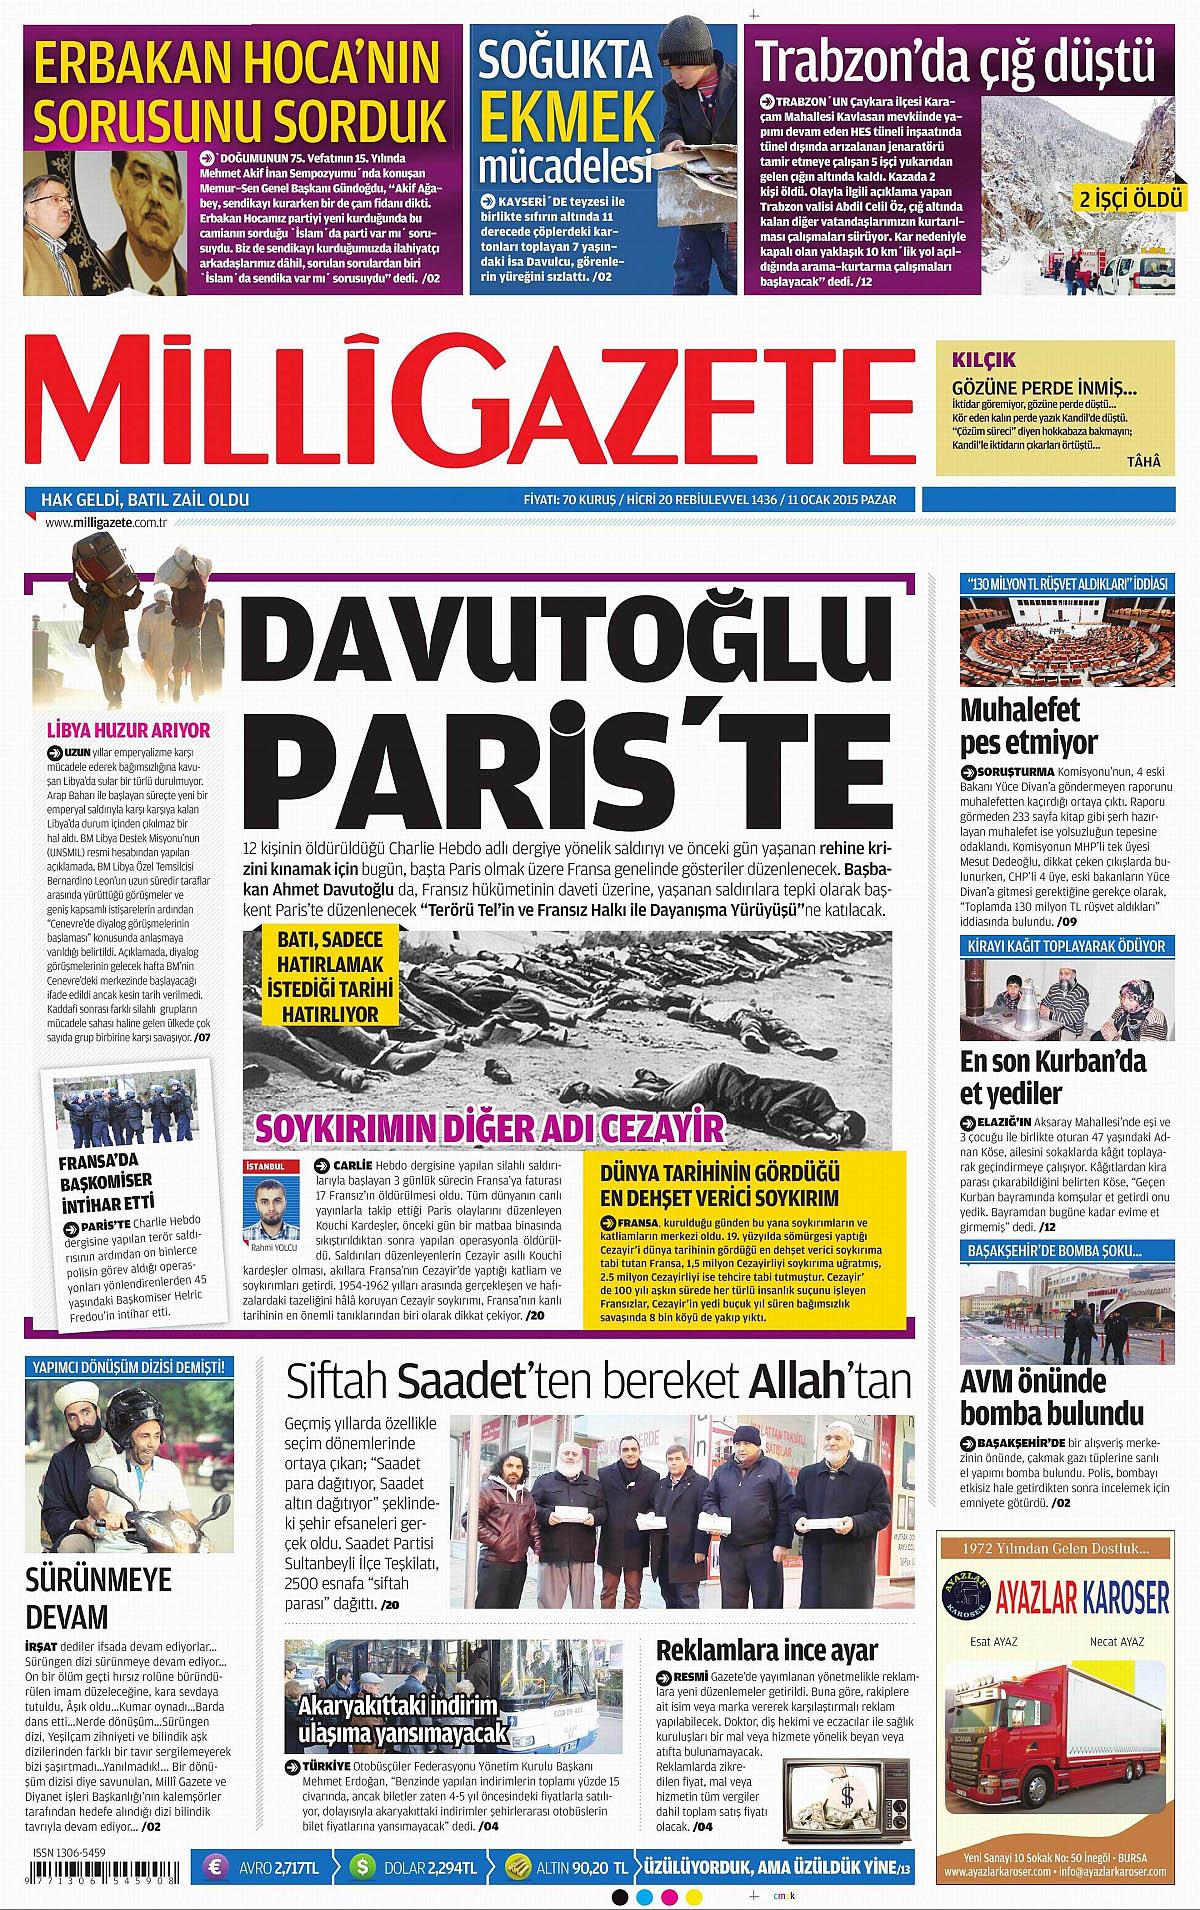 milli-gazete-gazetesi_82293